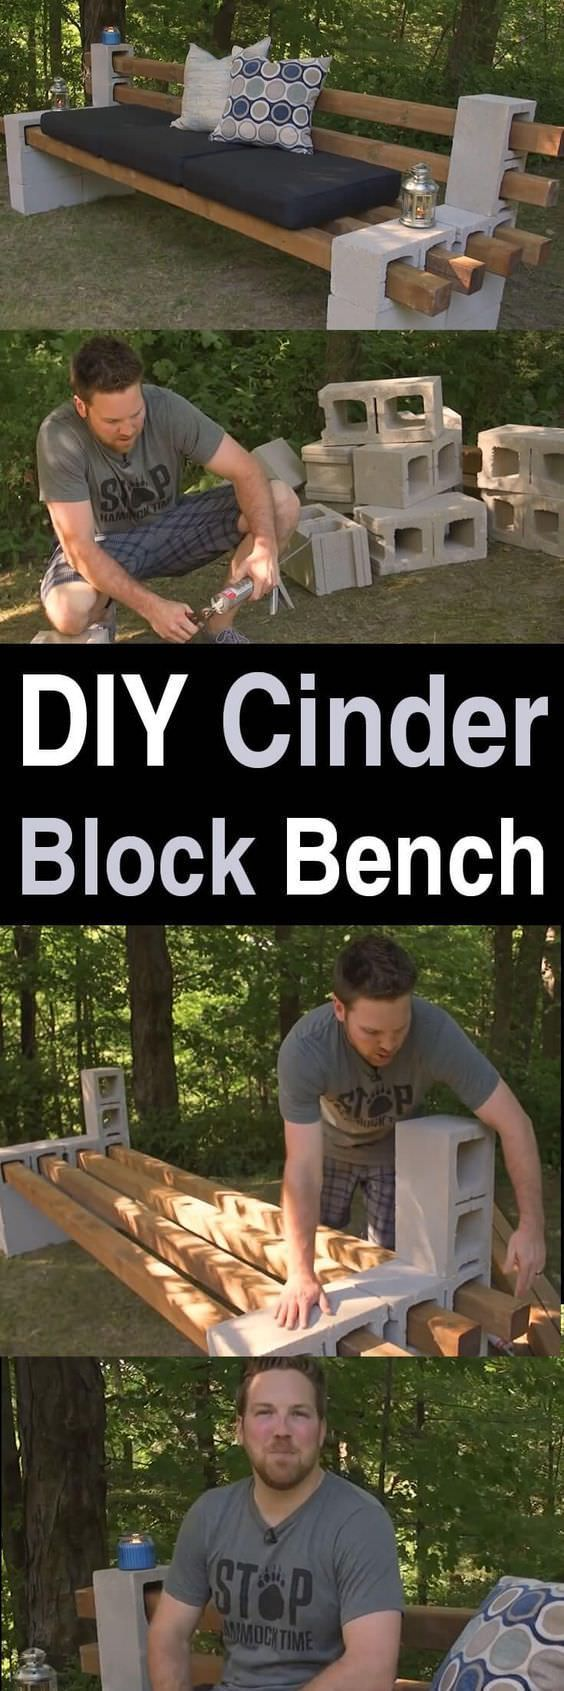 DIY Cinder Block Bank